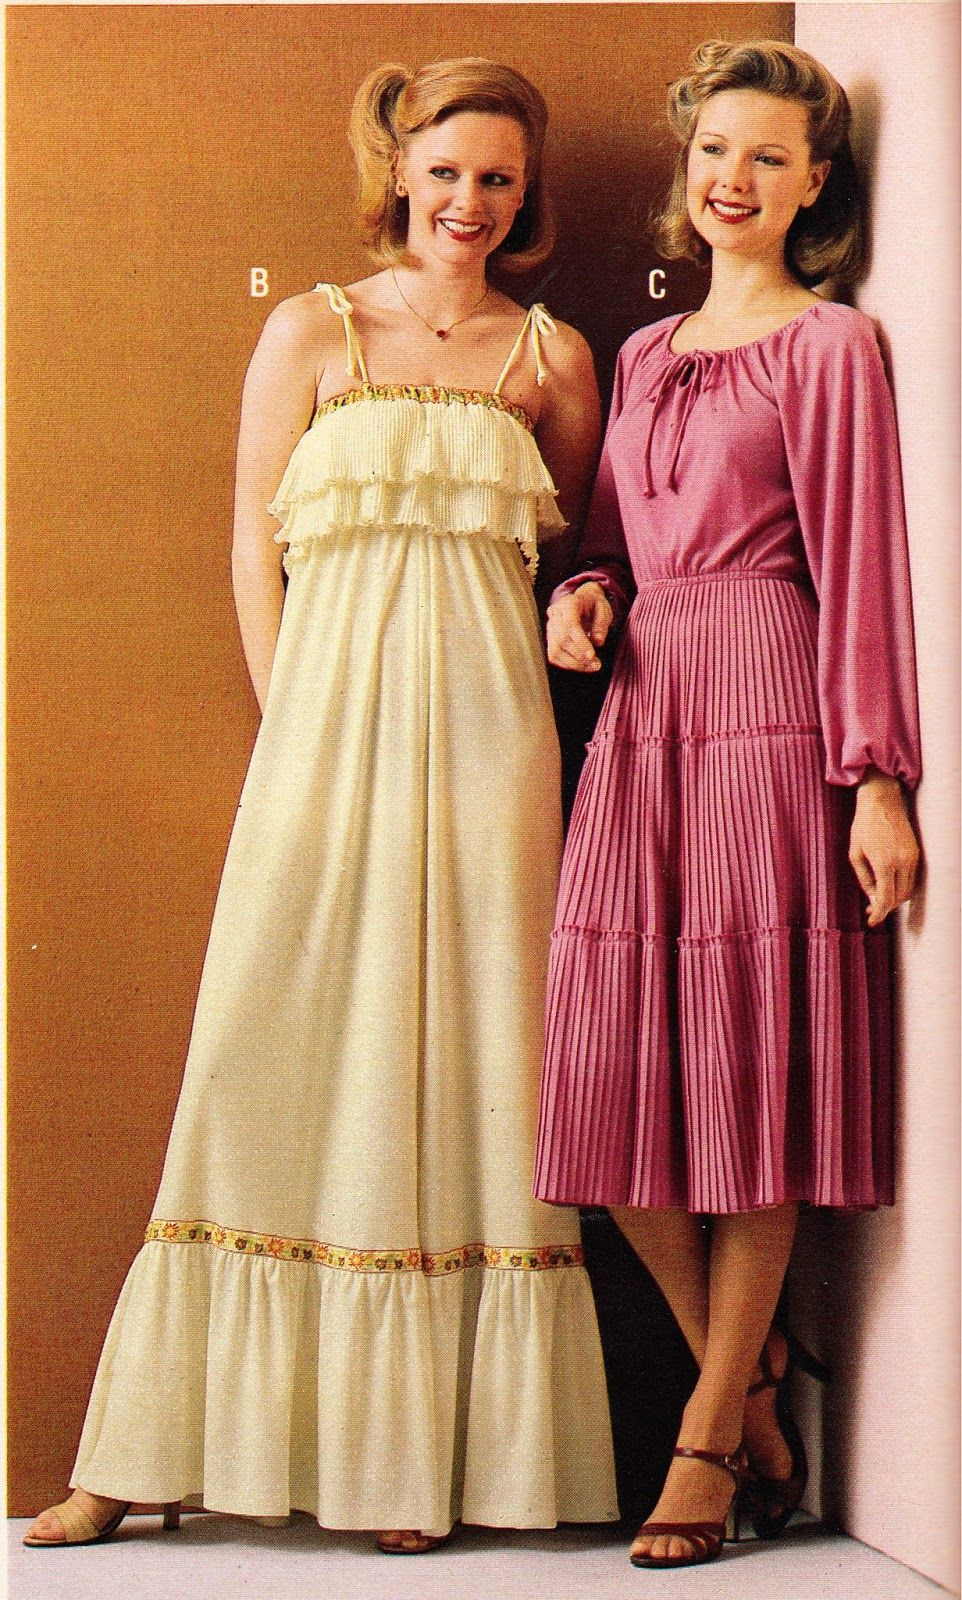 Groovy Fashion 70s Women Fashion 1970s Fashion [ 1600 x 962 Pixel ]